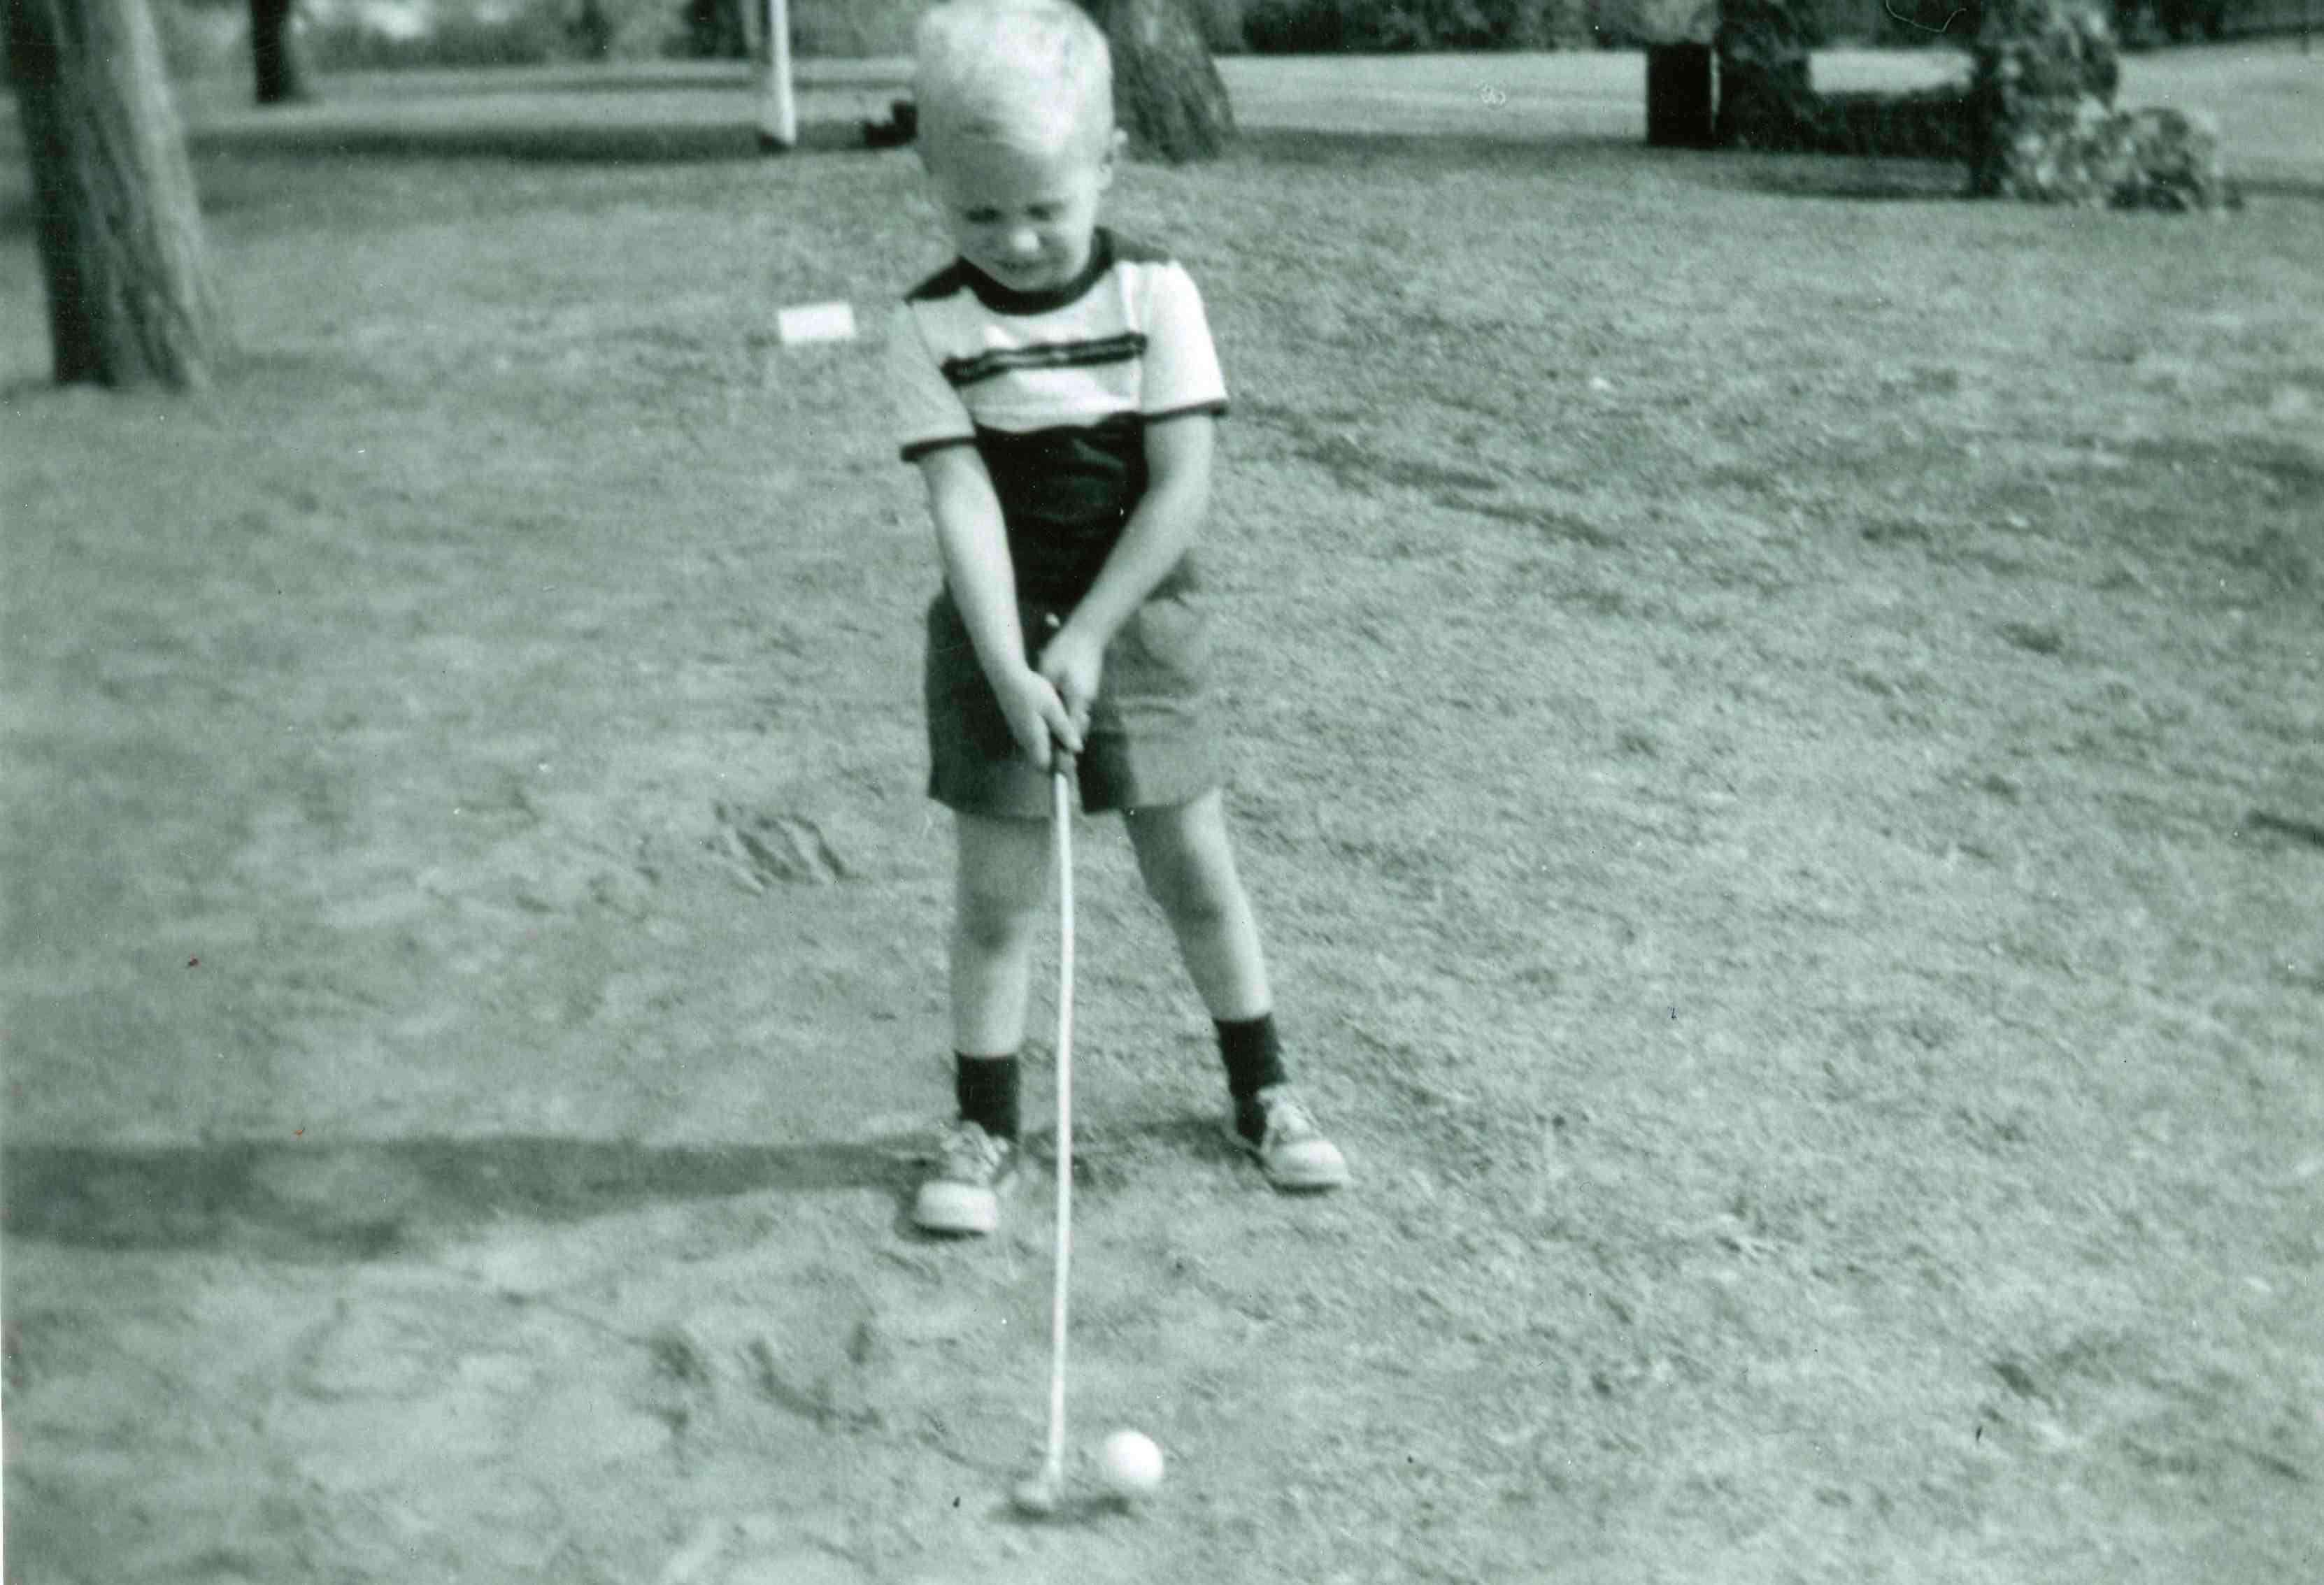 JDL Golf shot